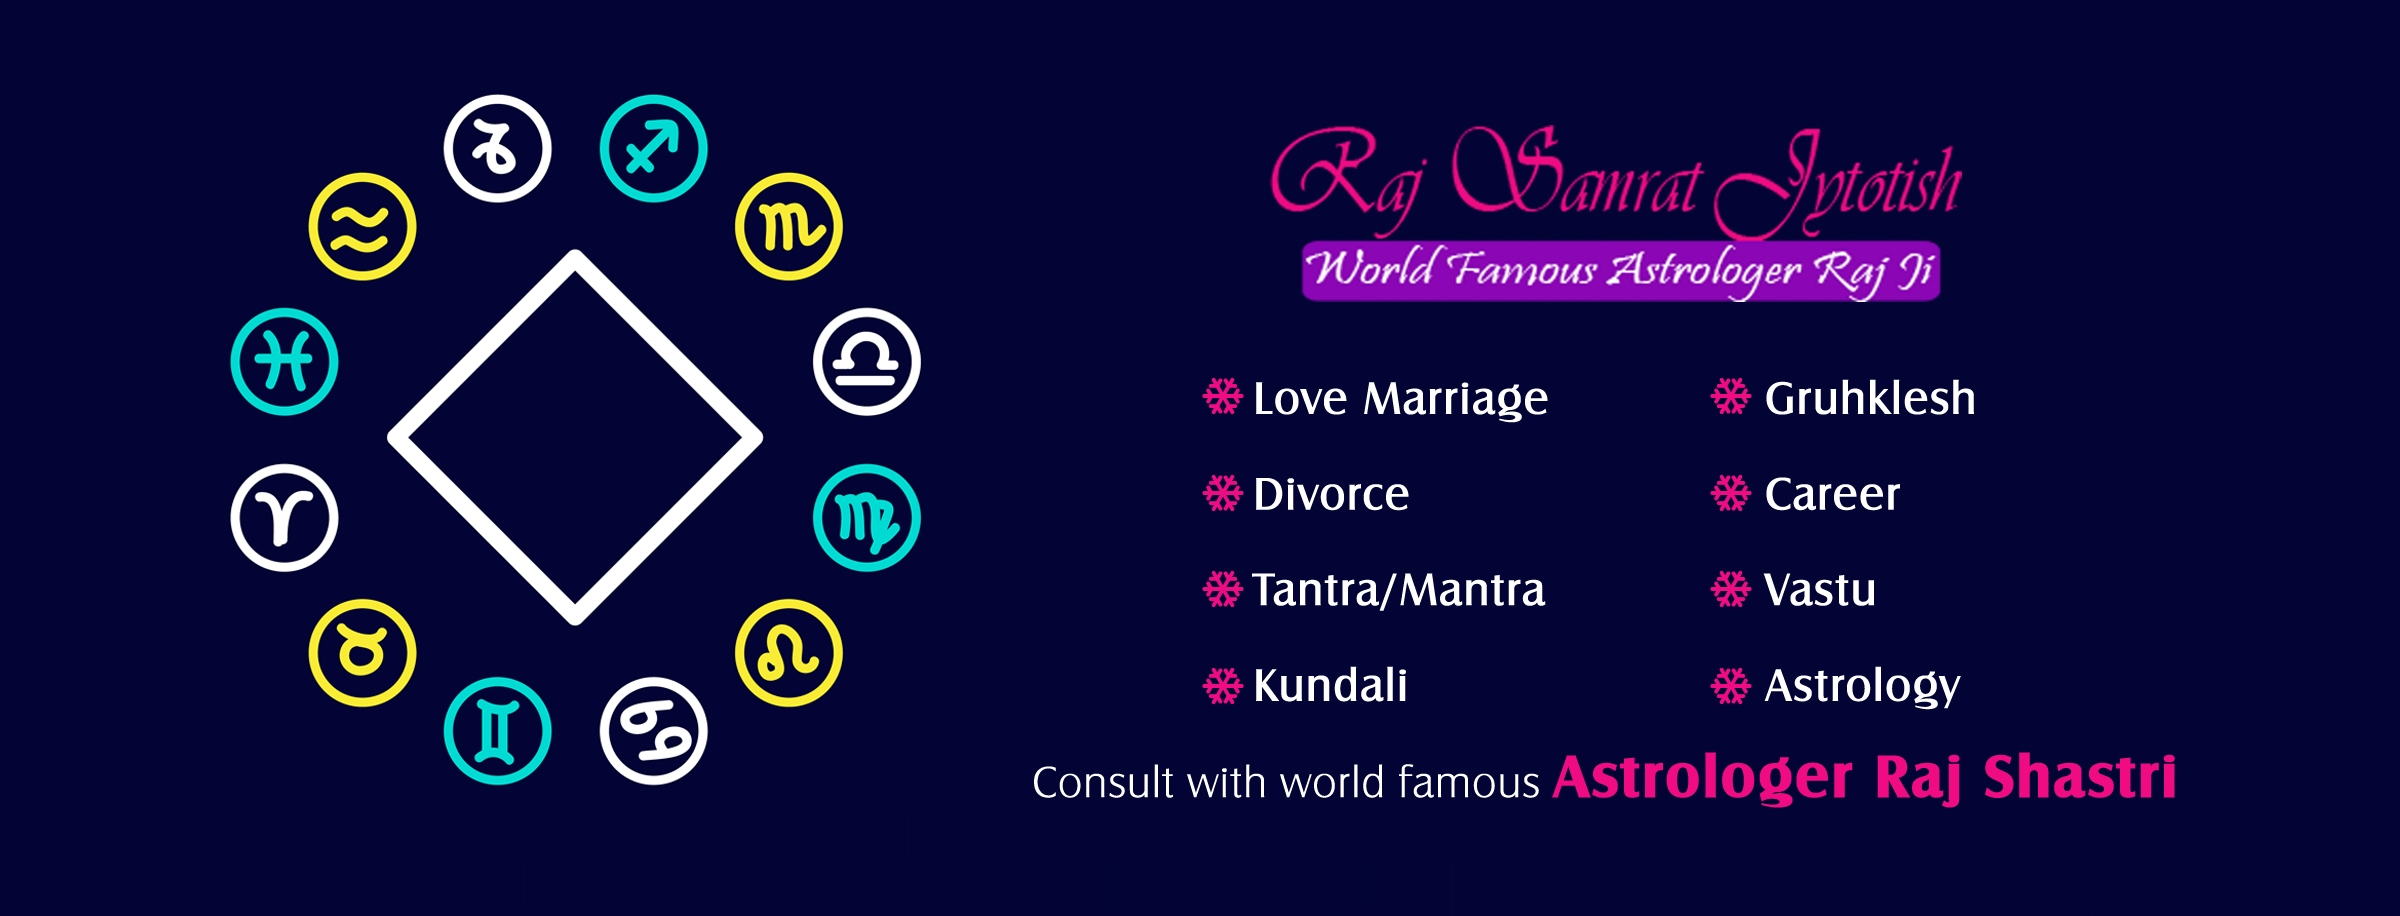 Raj Samrat Astro (@rajsamratastro) Cover Image